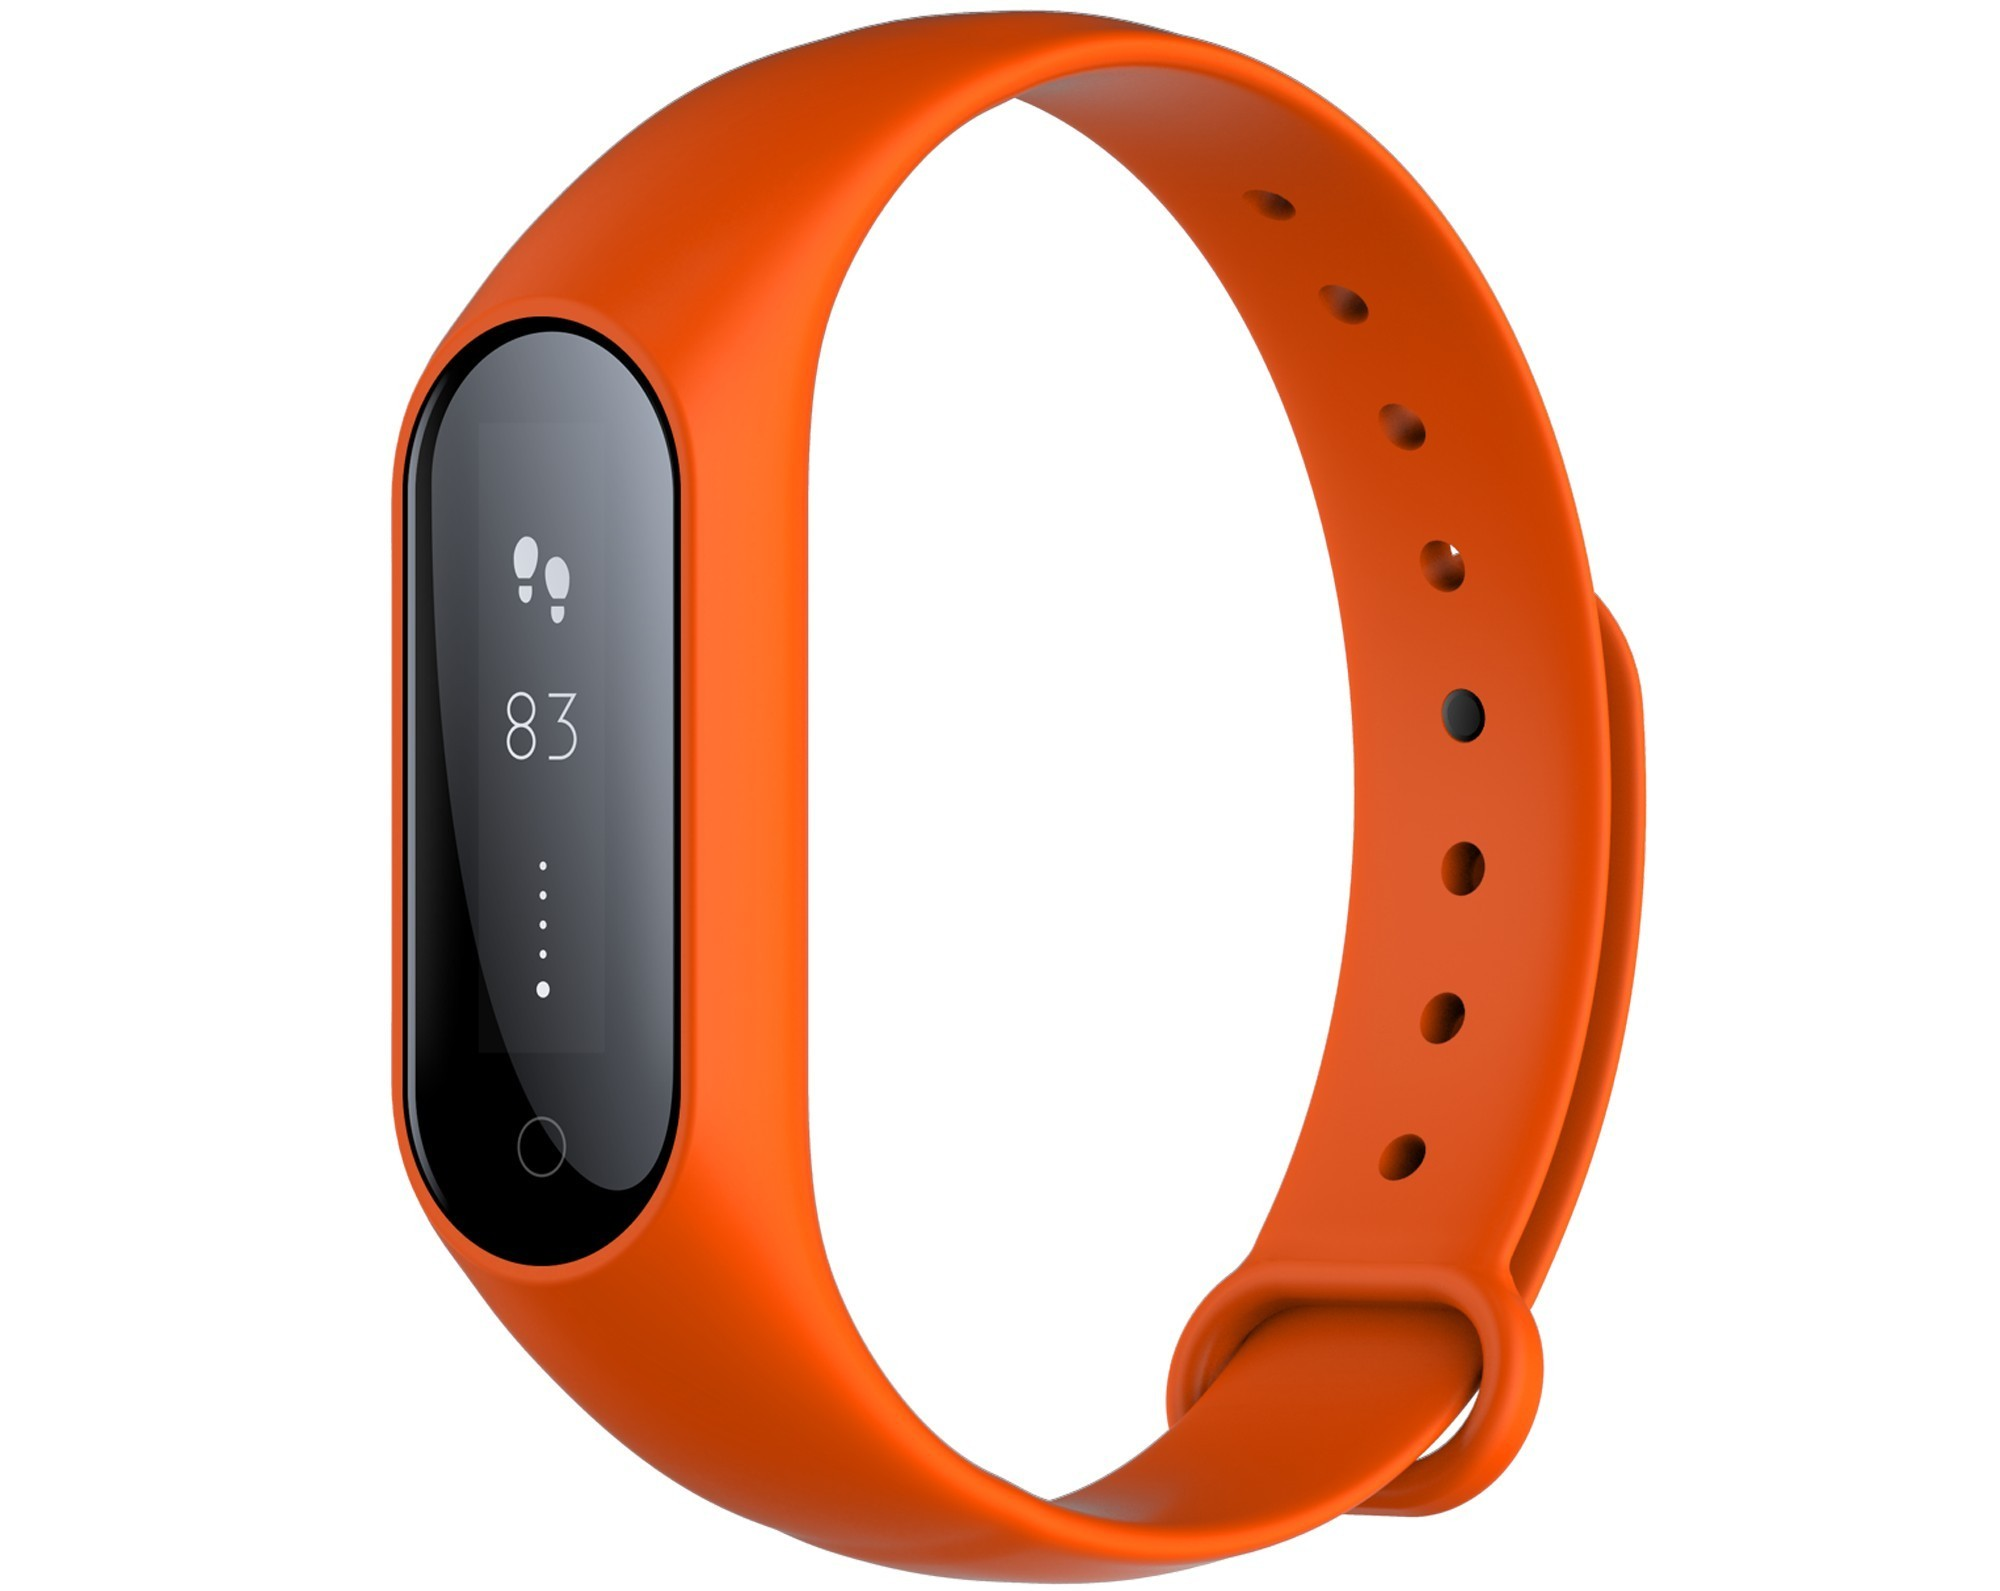 Bratara fitness iUni Y3, Bluetooth, display OLED, Notificari, Pedometru, Monitorizare Sedentarism, Puls, Oxigen sange, Orange imagine techstar.ro 2021